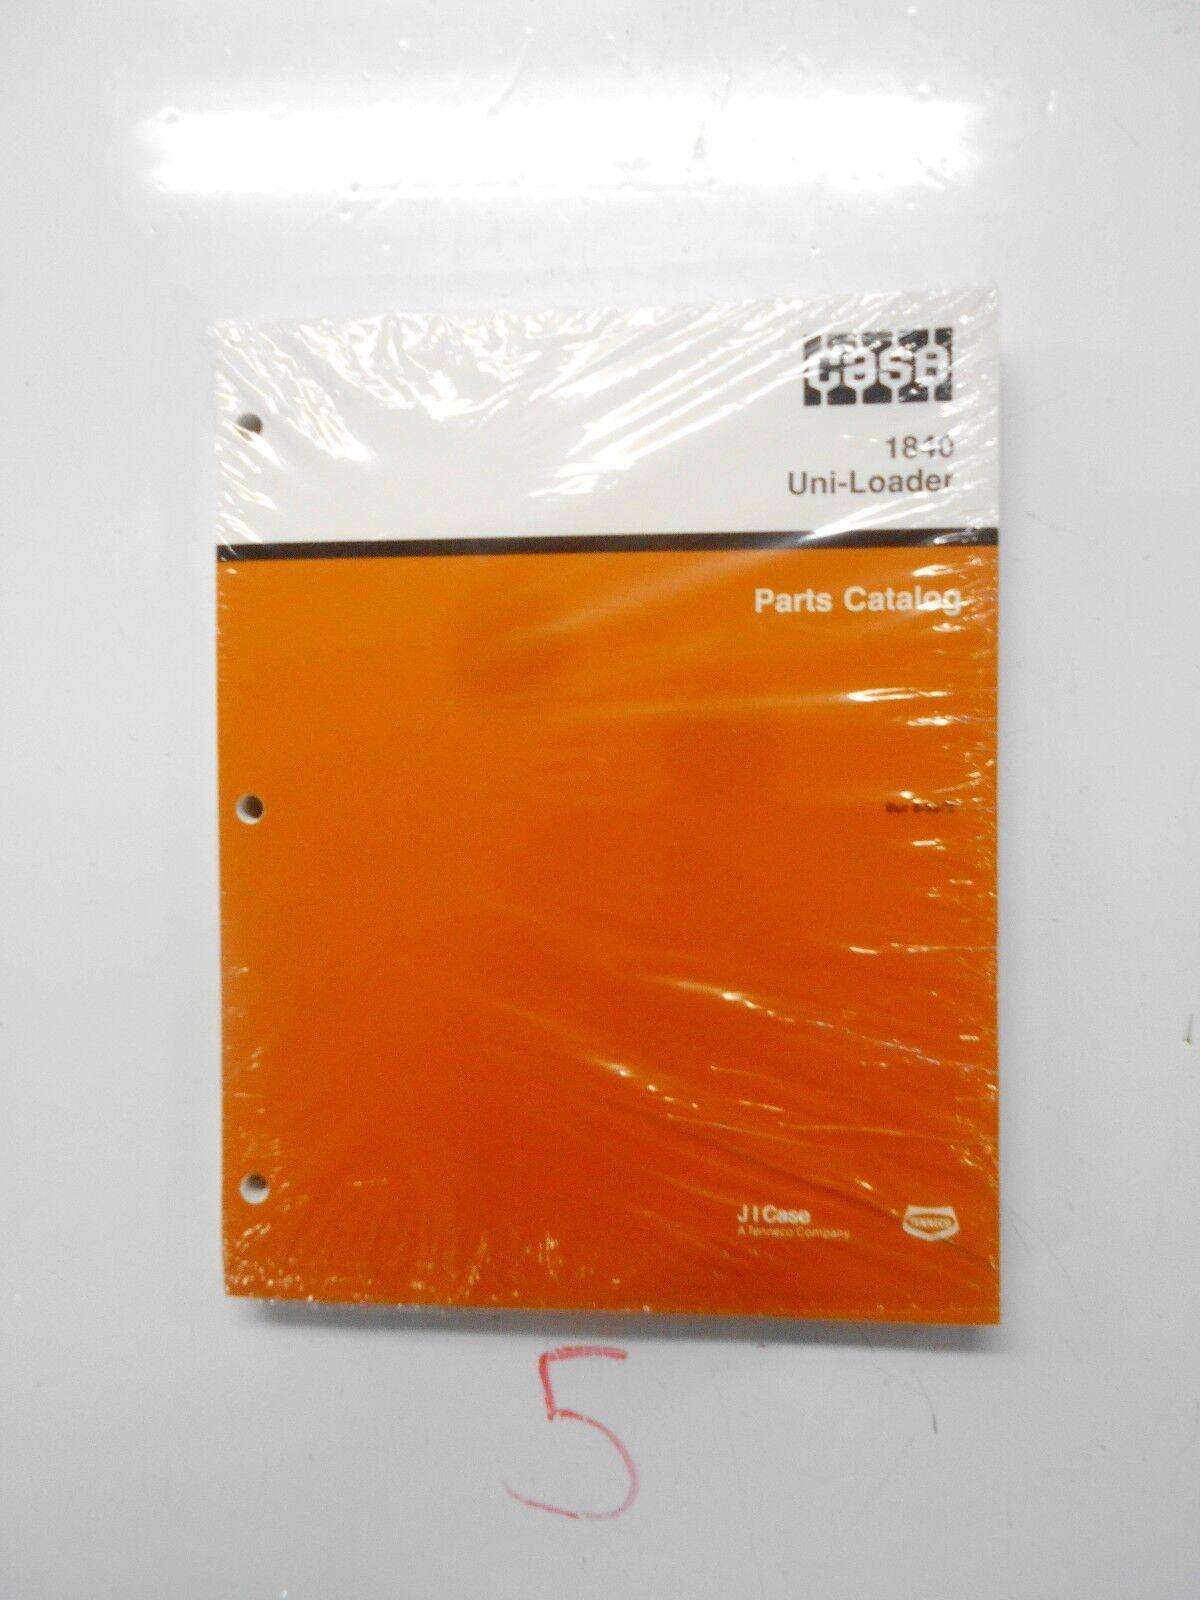 case 1840 uni loader parts manual catalog skid steer assembly rh ebay com Case 1840 Schematic Diagram Case 1840 Service Manual